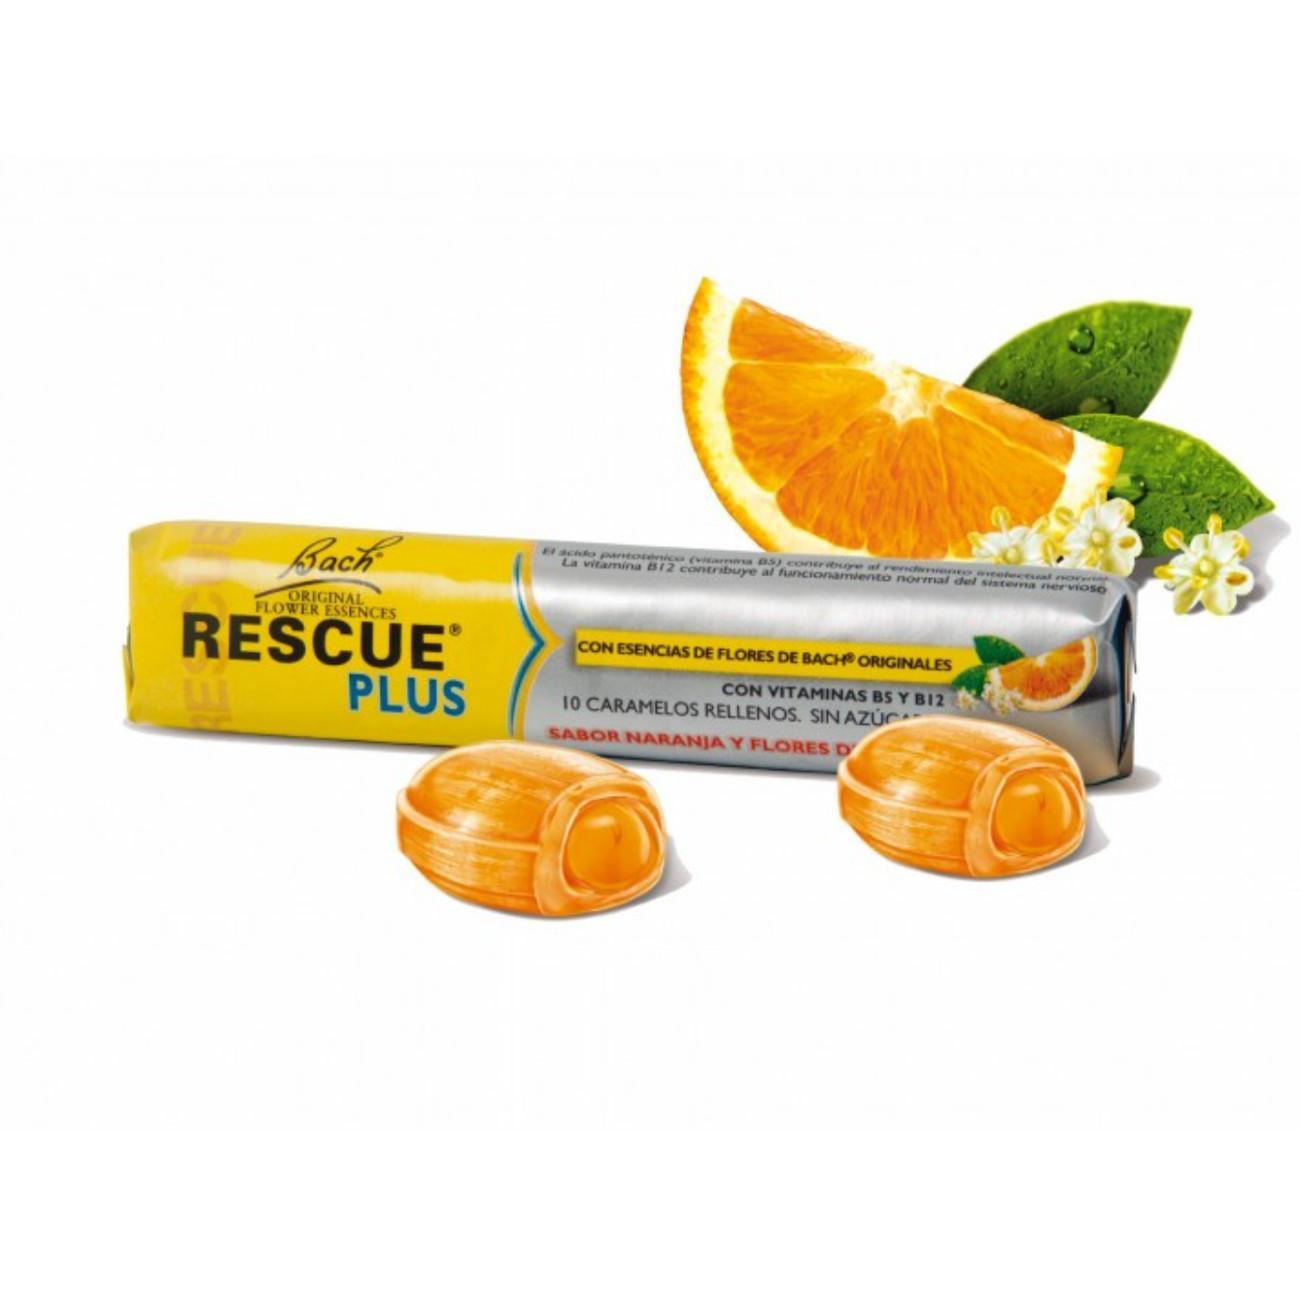 Dr. Bach Krizové bonbony s vitamíny, Rescue Plus 10 ks, 42 g